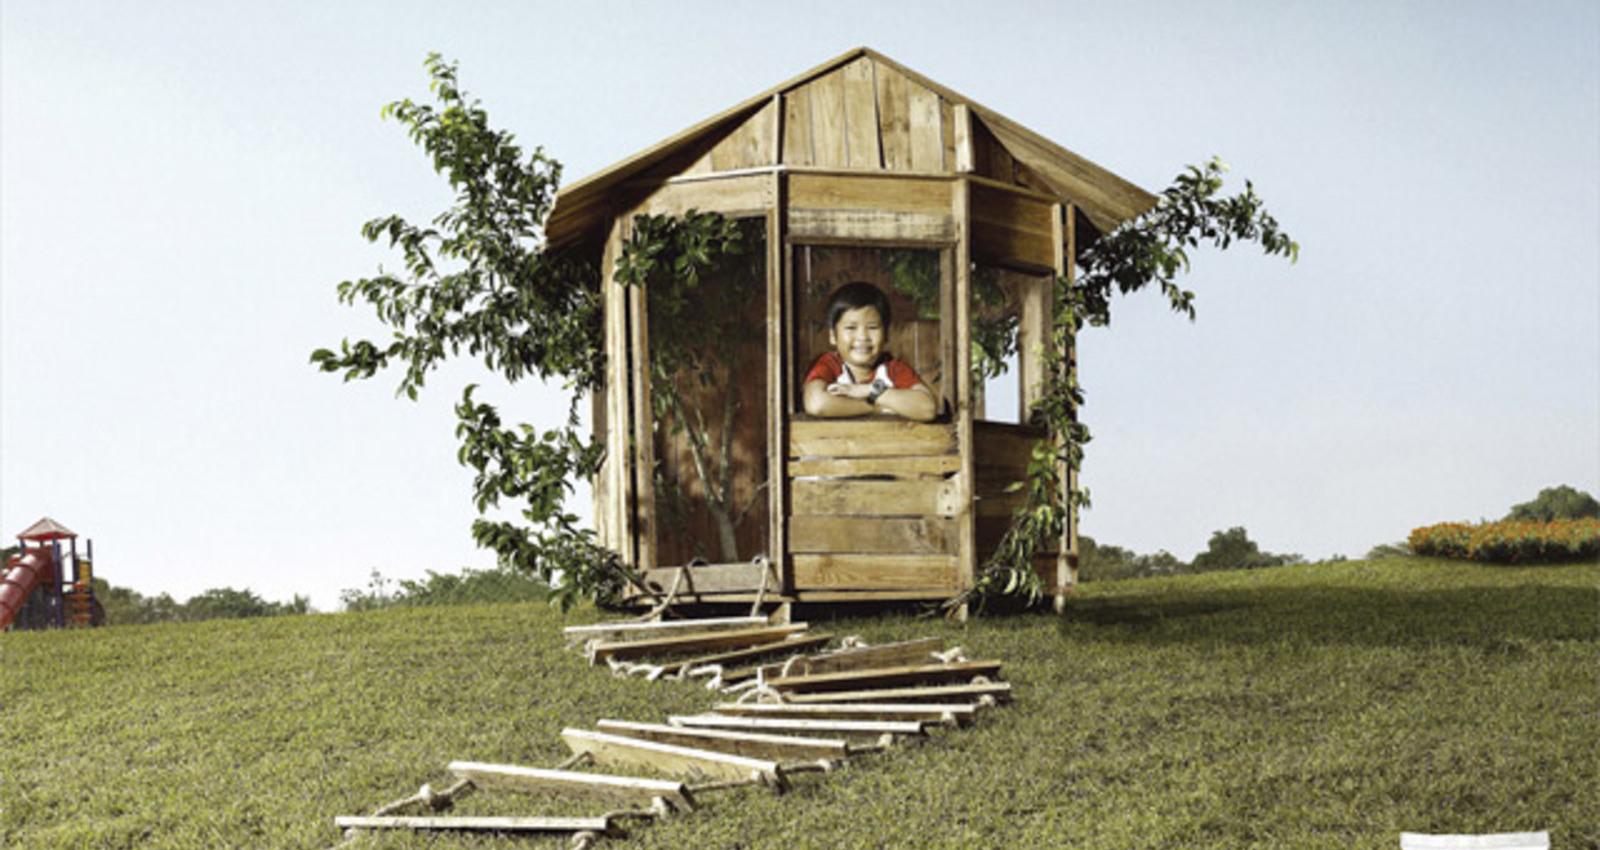 Swing, Saw, Treehouse